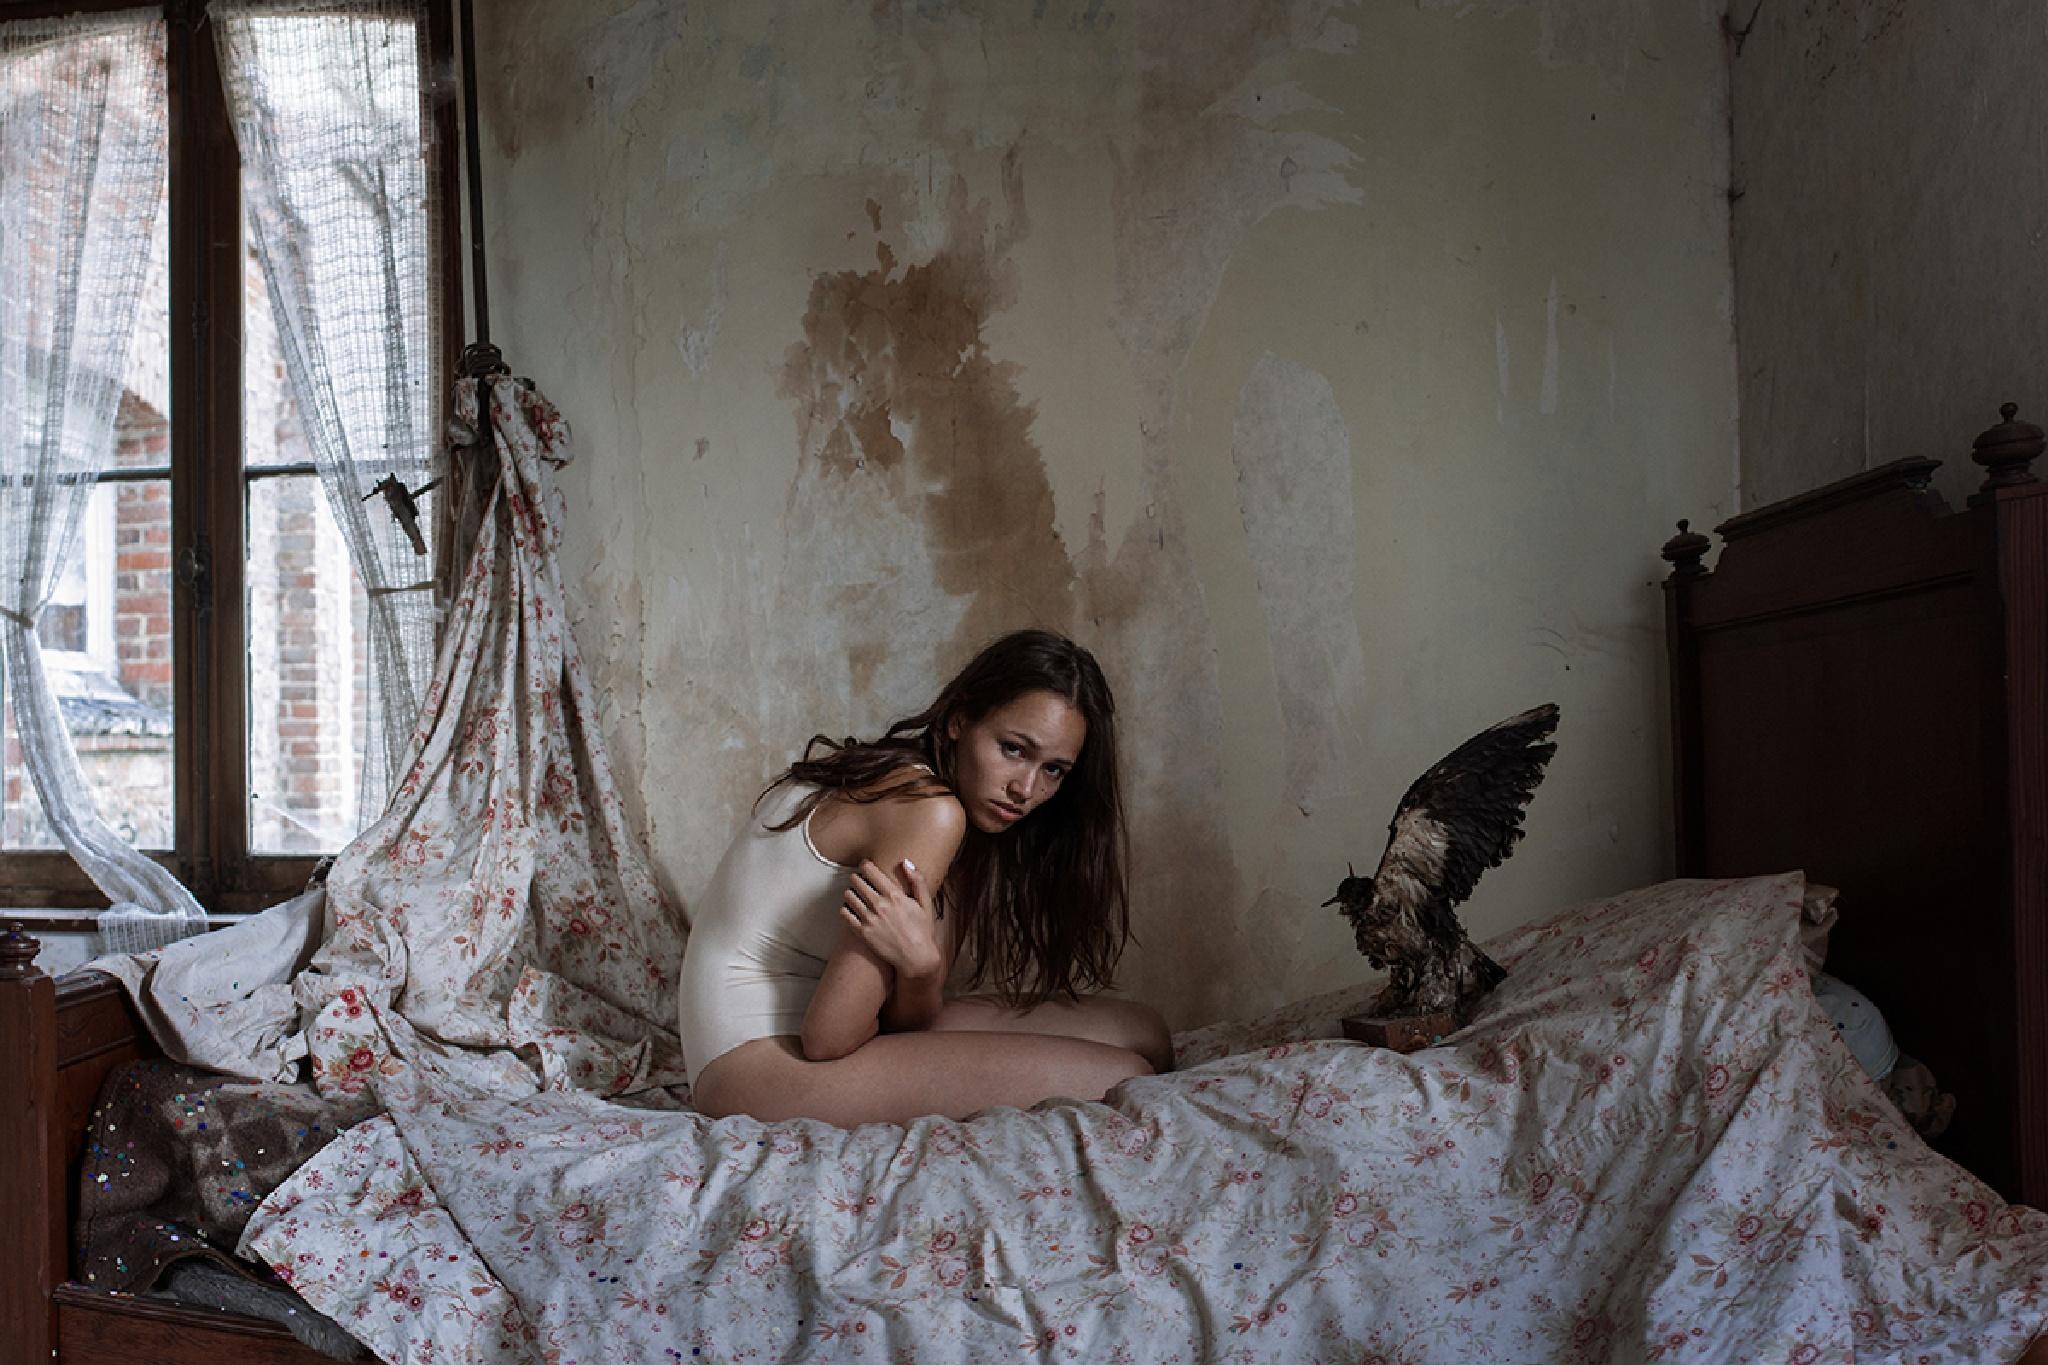 Catalina and the bird by Katja Kemnitz